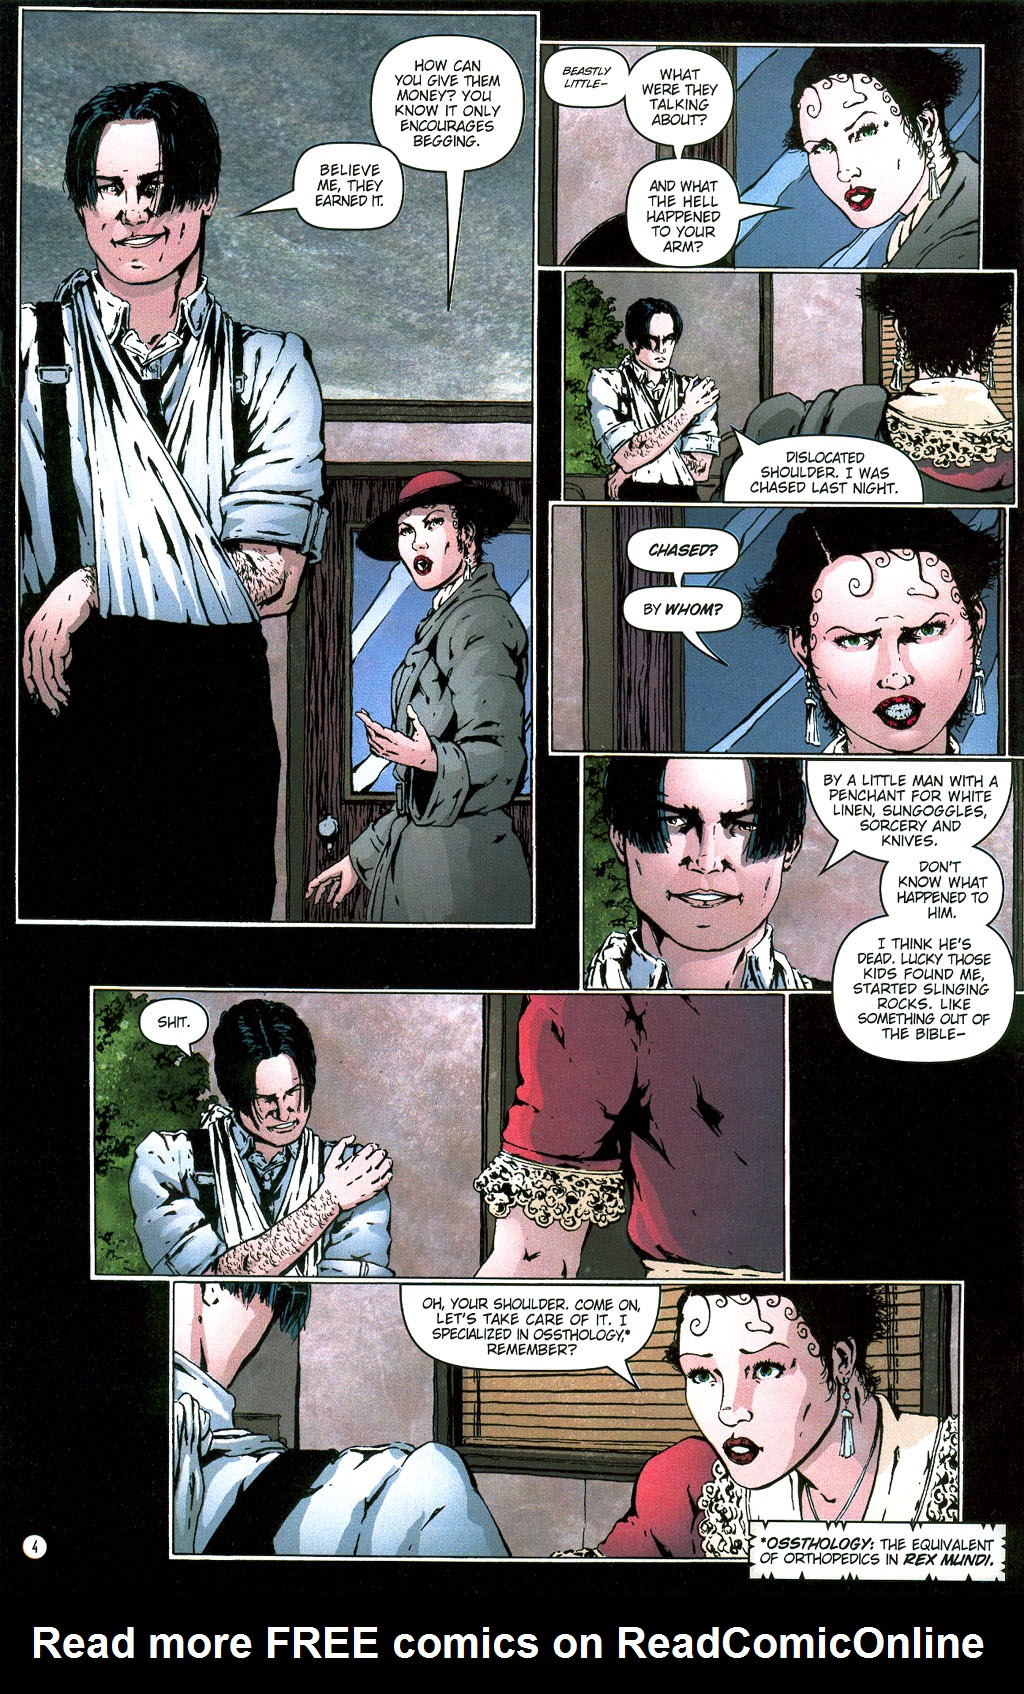 Read online Rex Mundi comic -  Issue #6 - 7